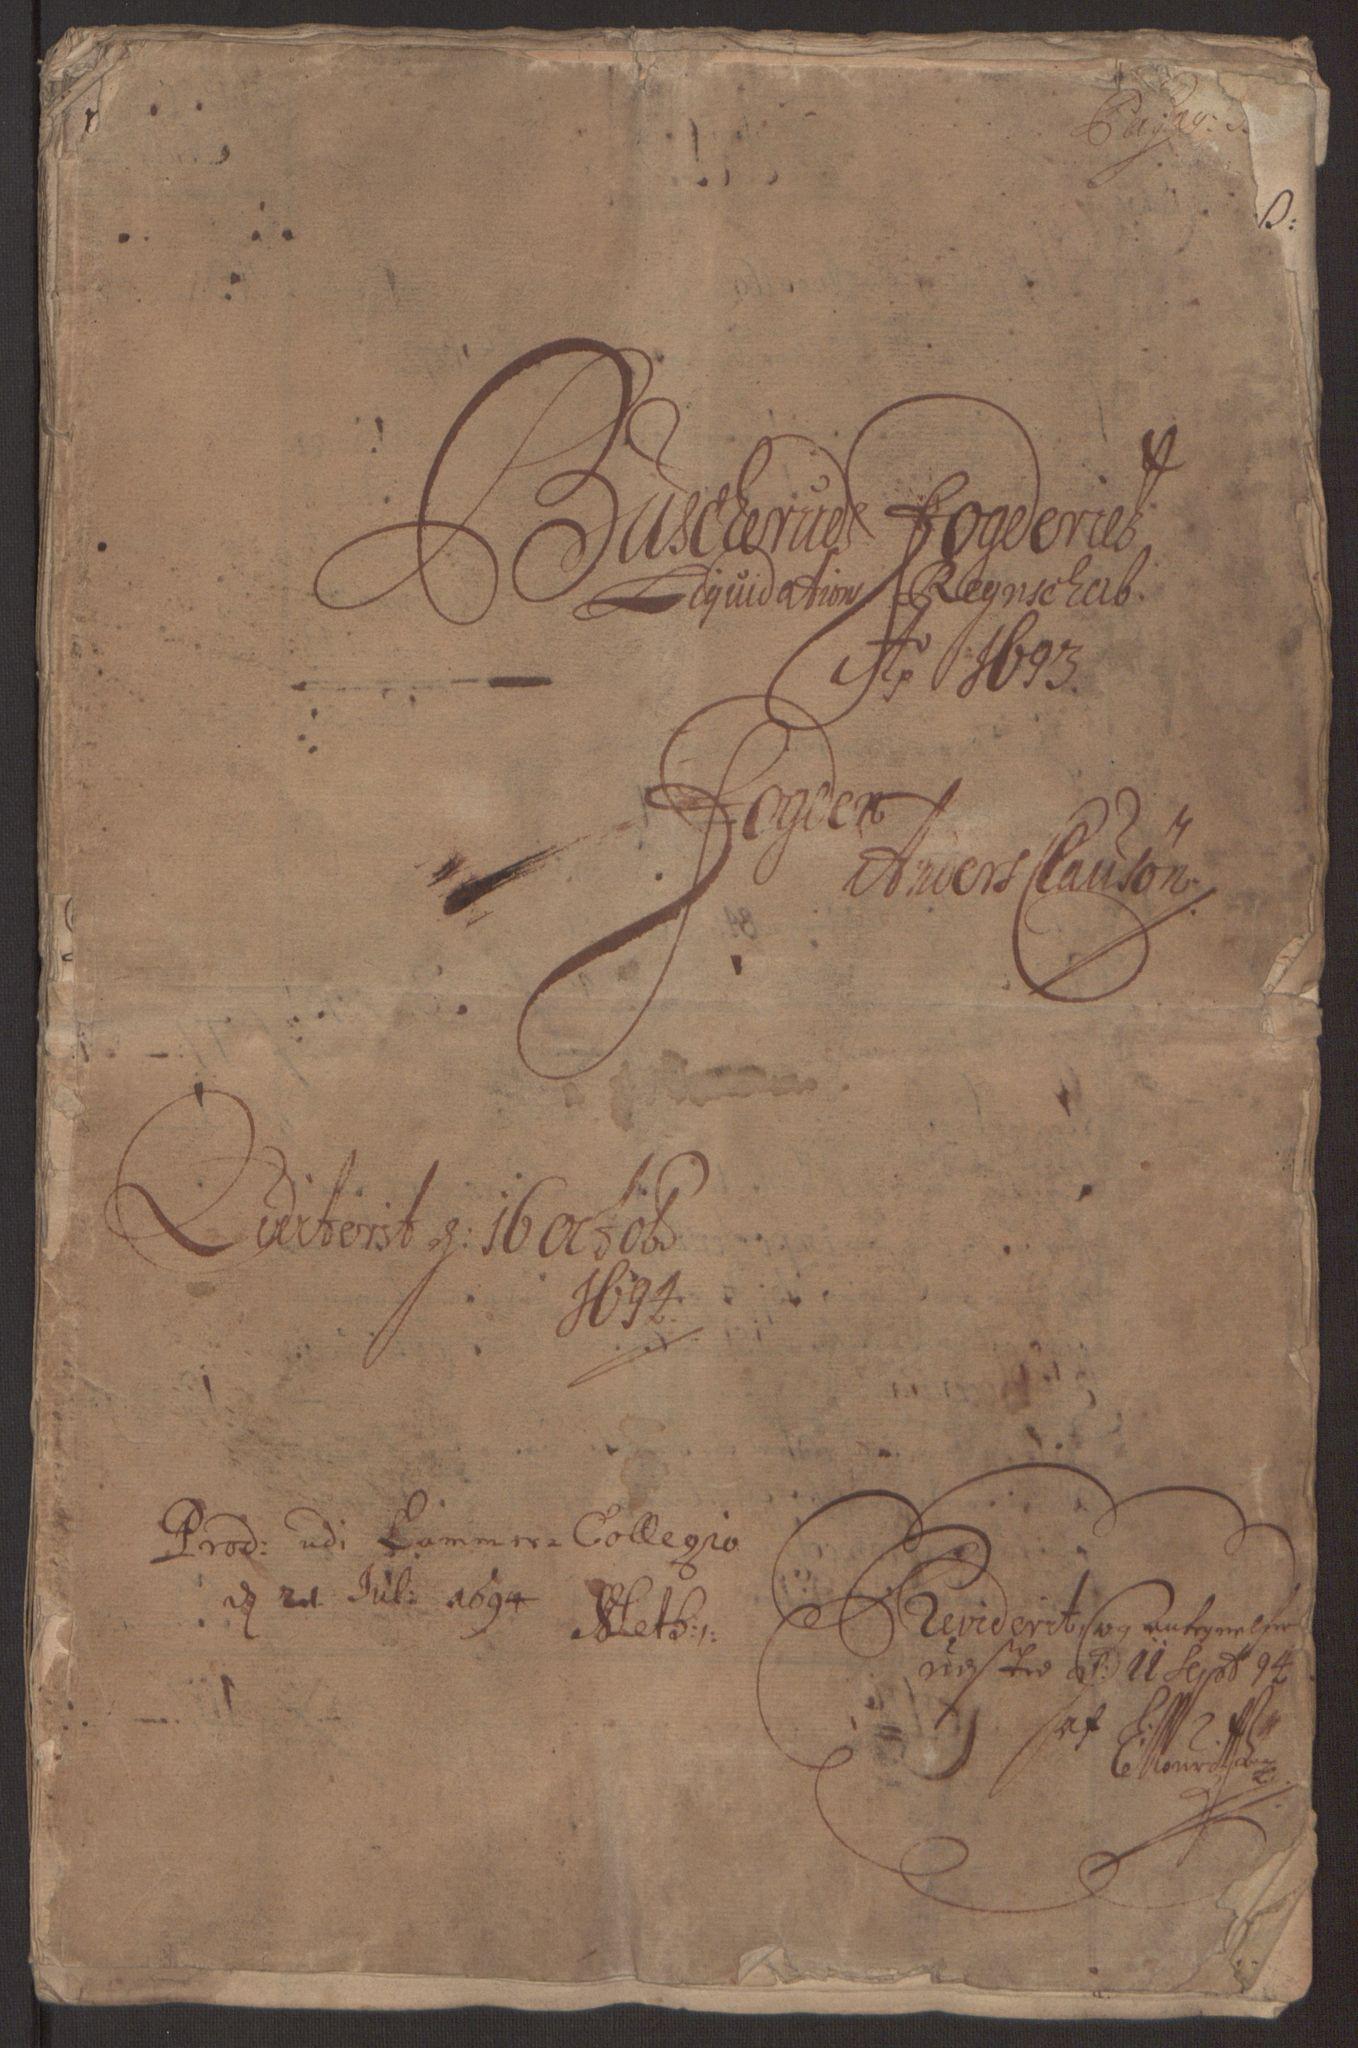 RA, Rentekammeret inntil 1814, Reviderte regnskaper, Fogderegnskap, R25/L1682: Fogderegnskap Buskerud, 1693, s. 3